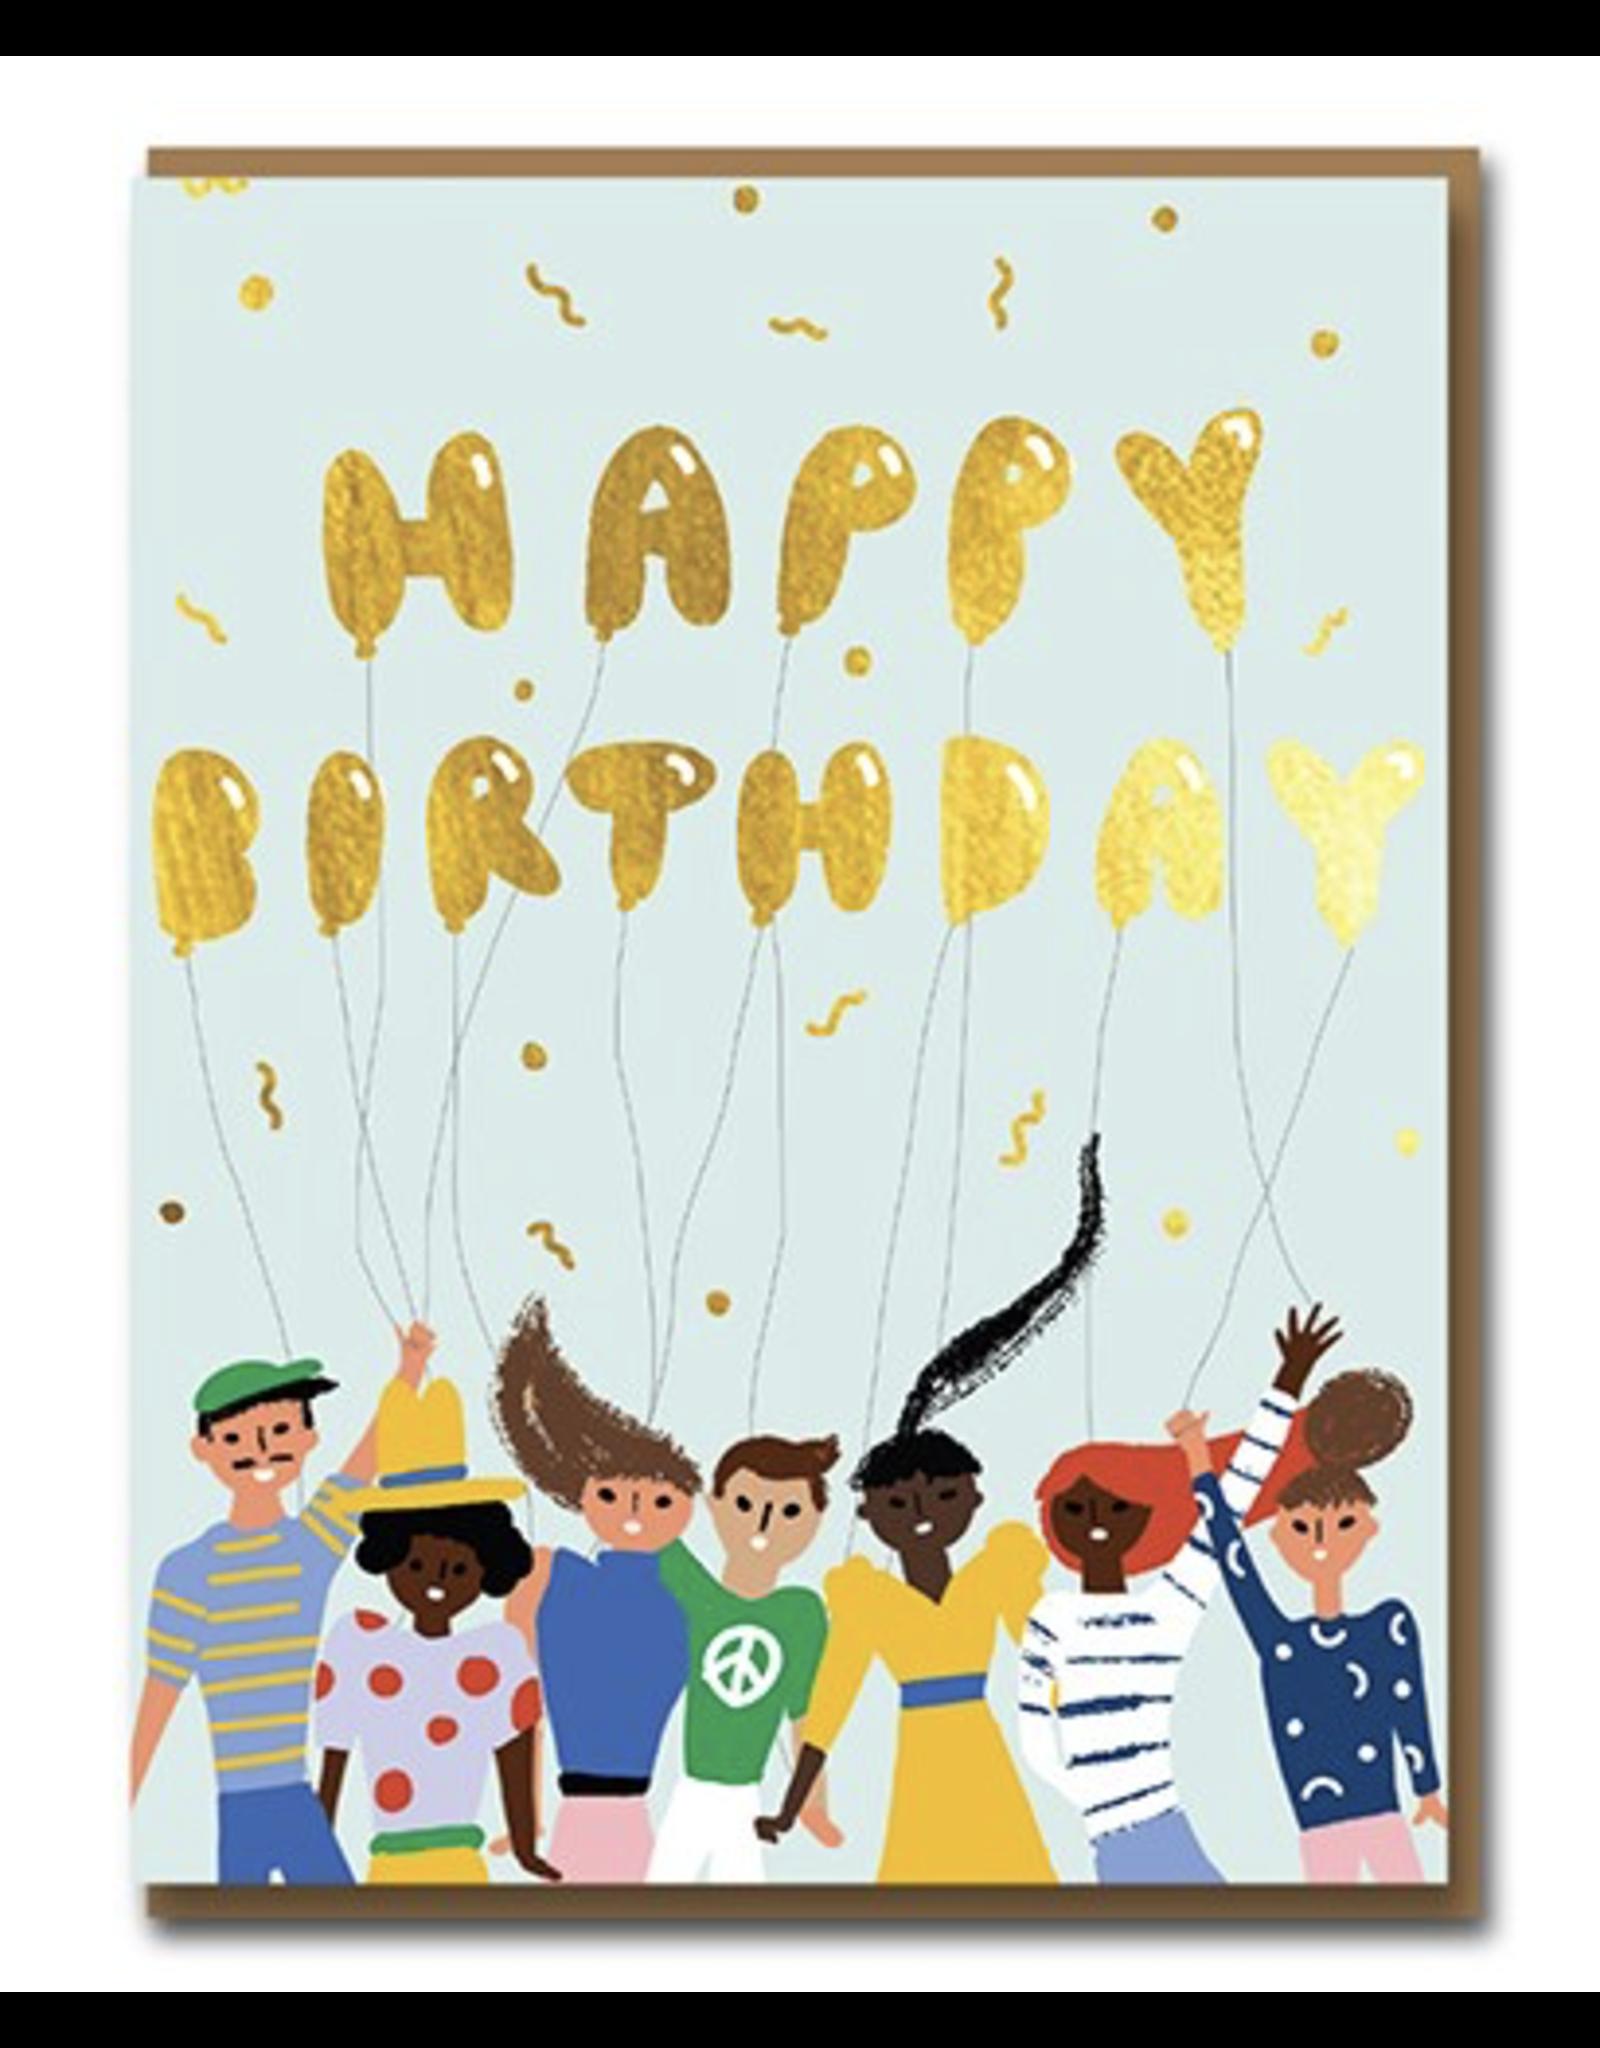 Birthday - Tomodachi Balloons